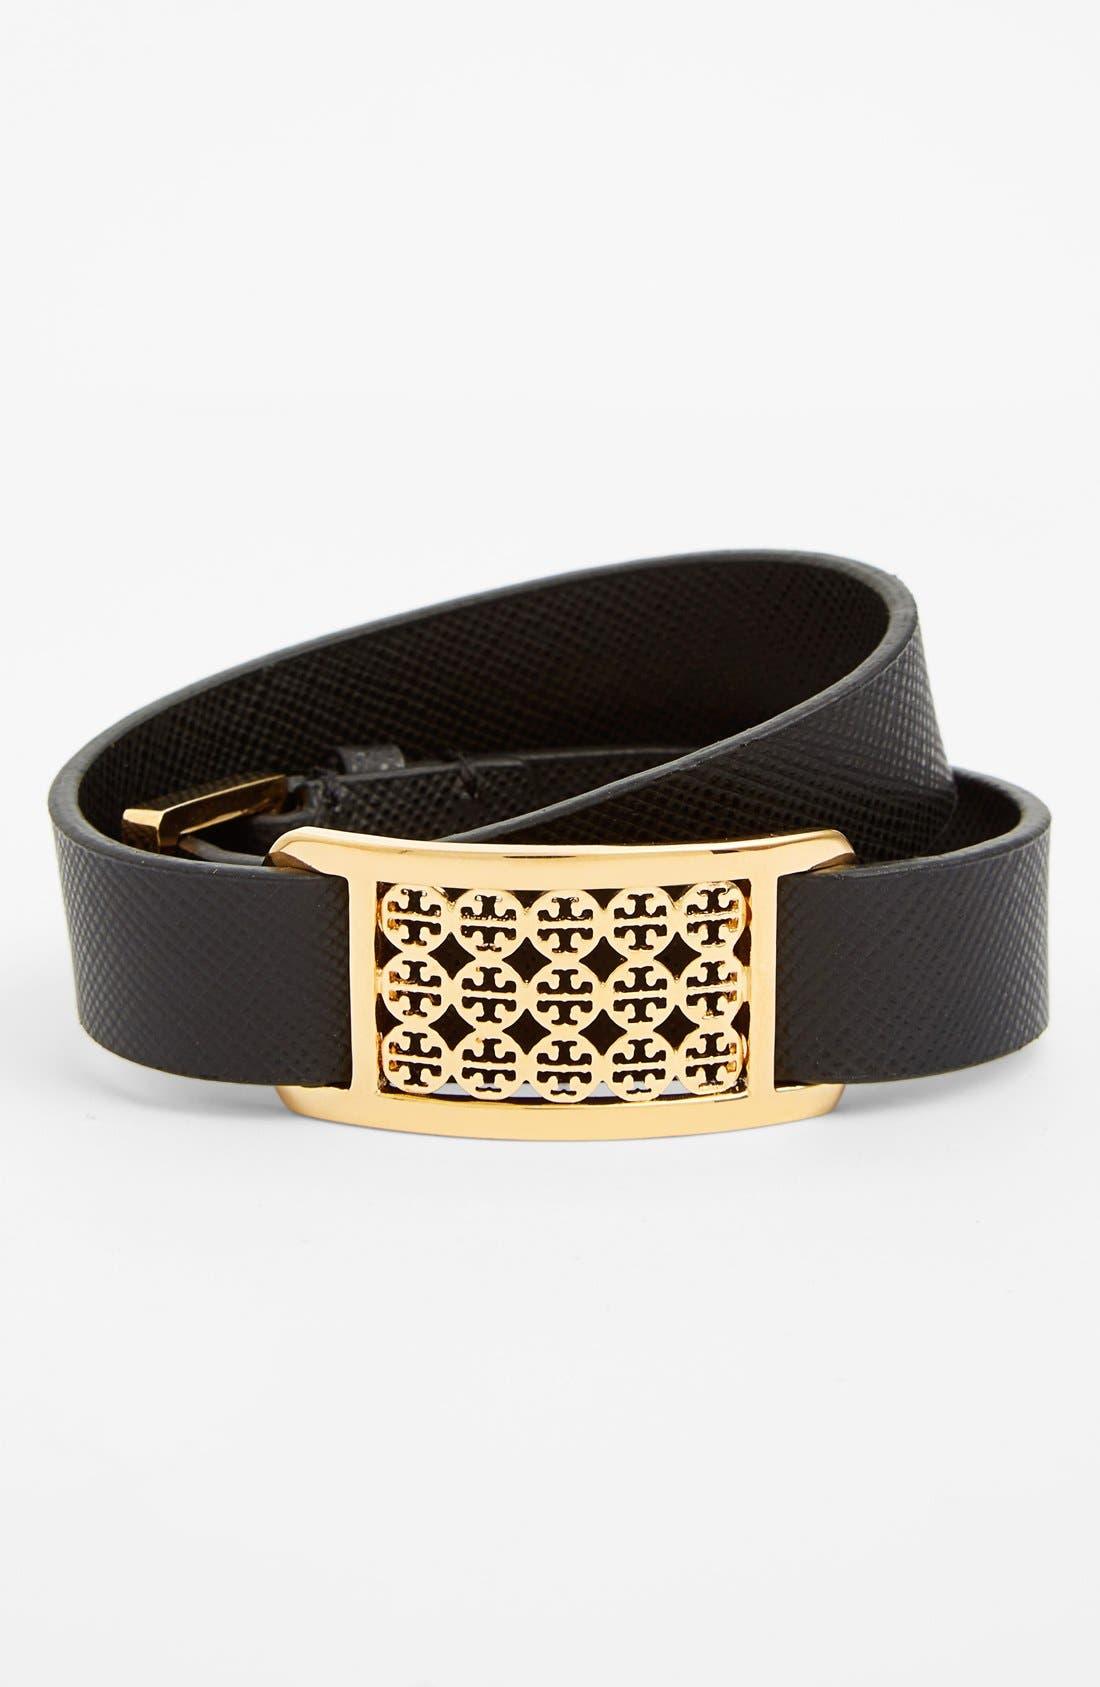 Alternate Image 1 Selected - Tory Burch 'Kinsley' Logo Plaque Leather Wrap Bracelet